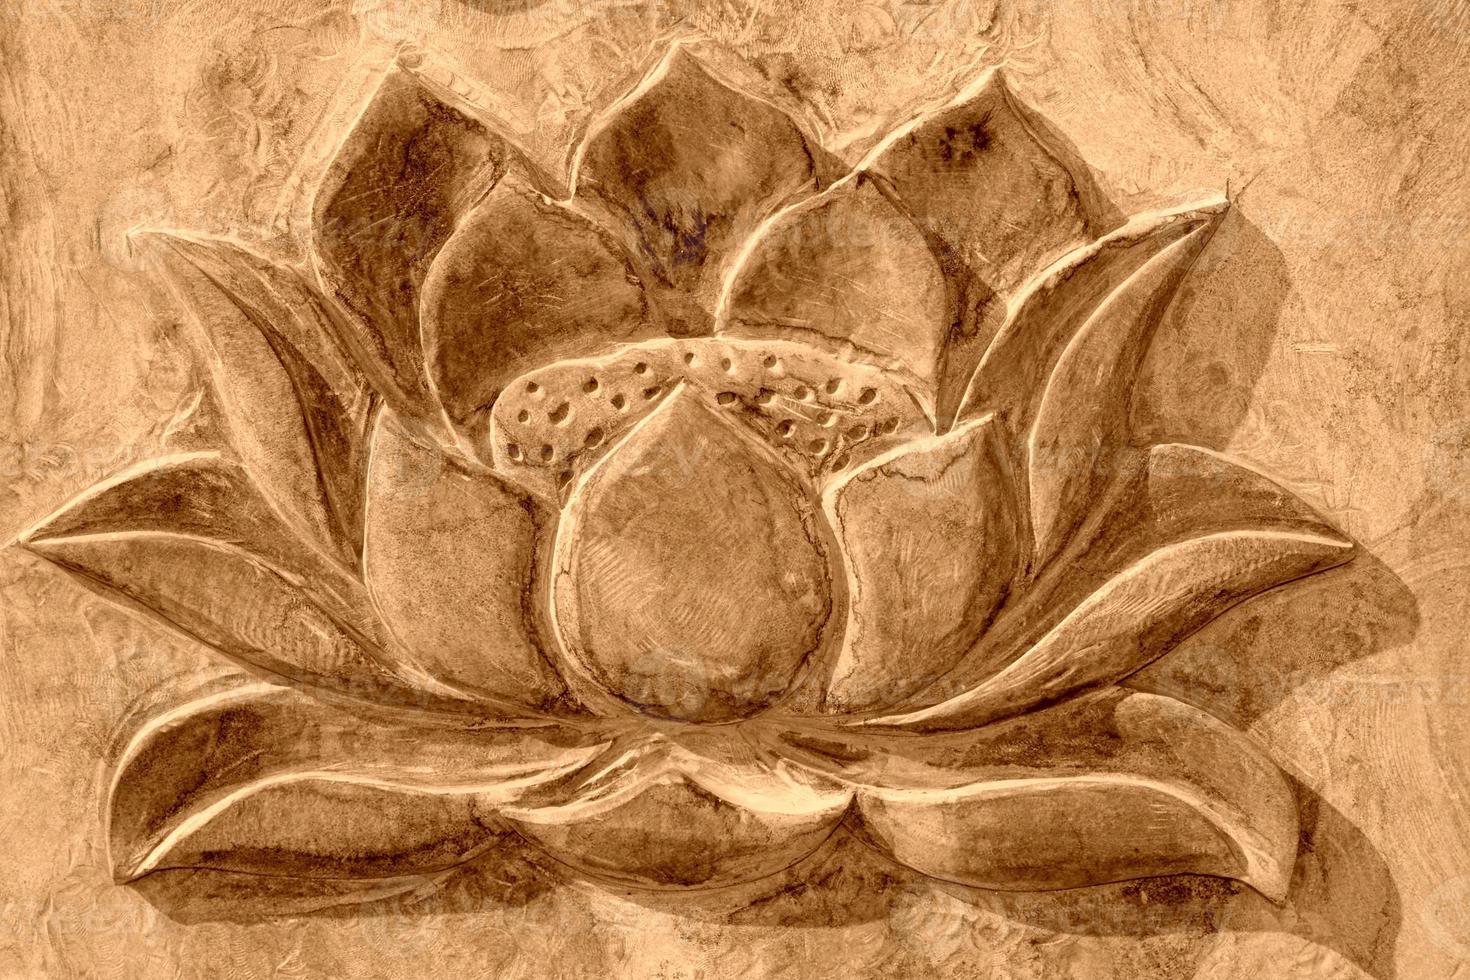 lótus esculpido na rocha cinza foto